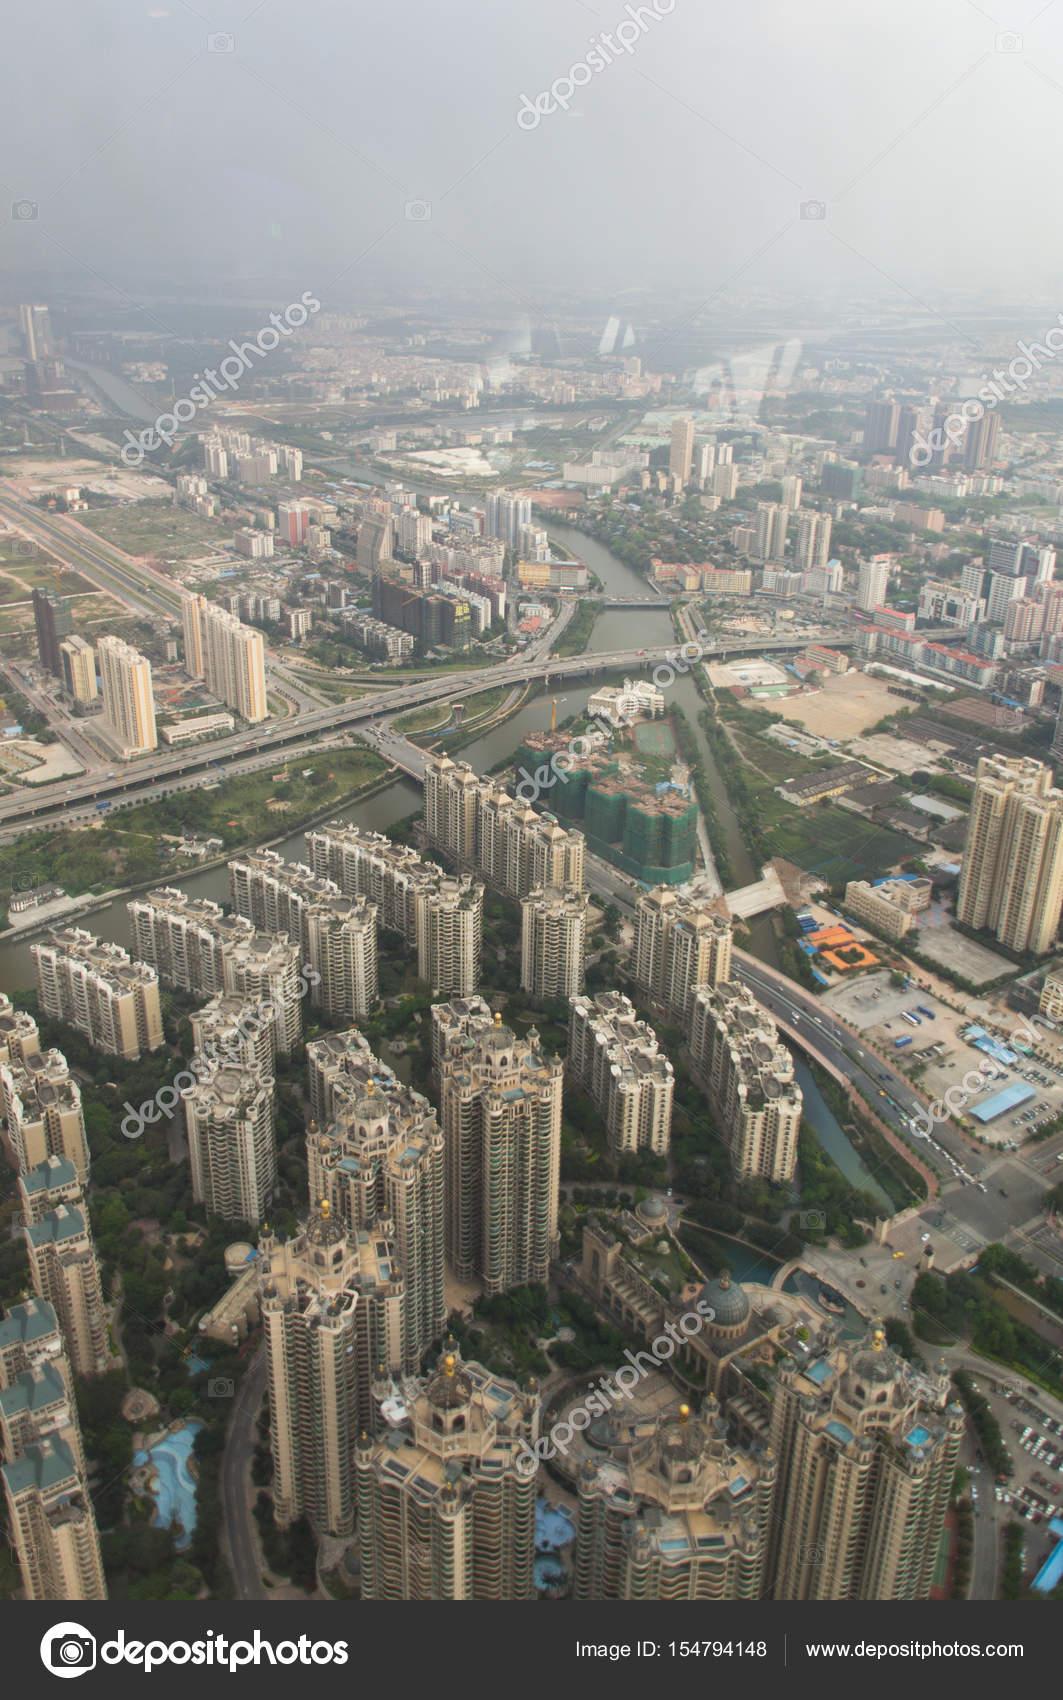 Skyscrapers In China Cities Aerial View Stock Photo C Yashka7